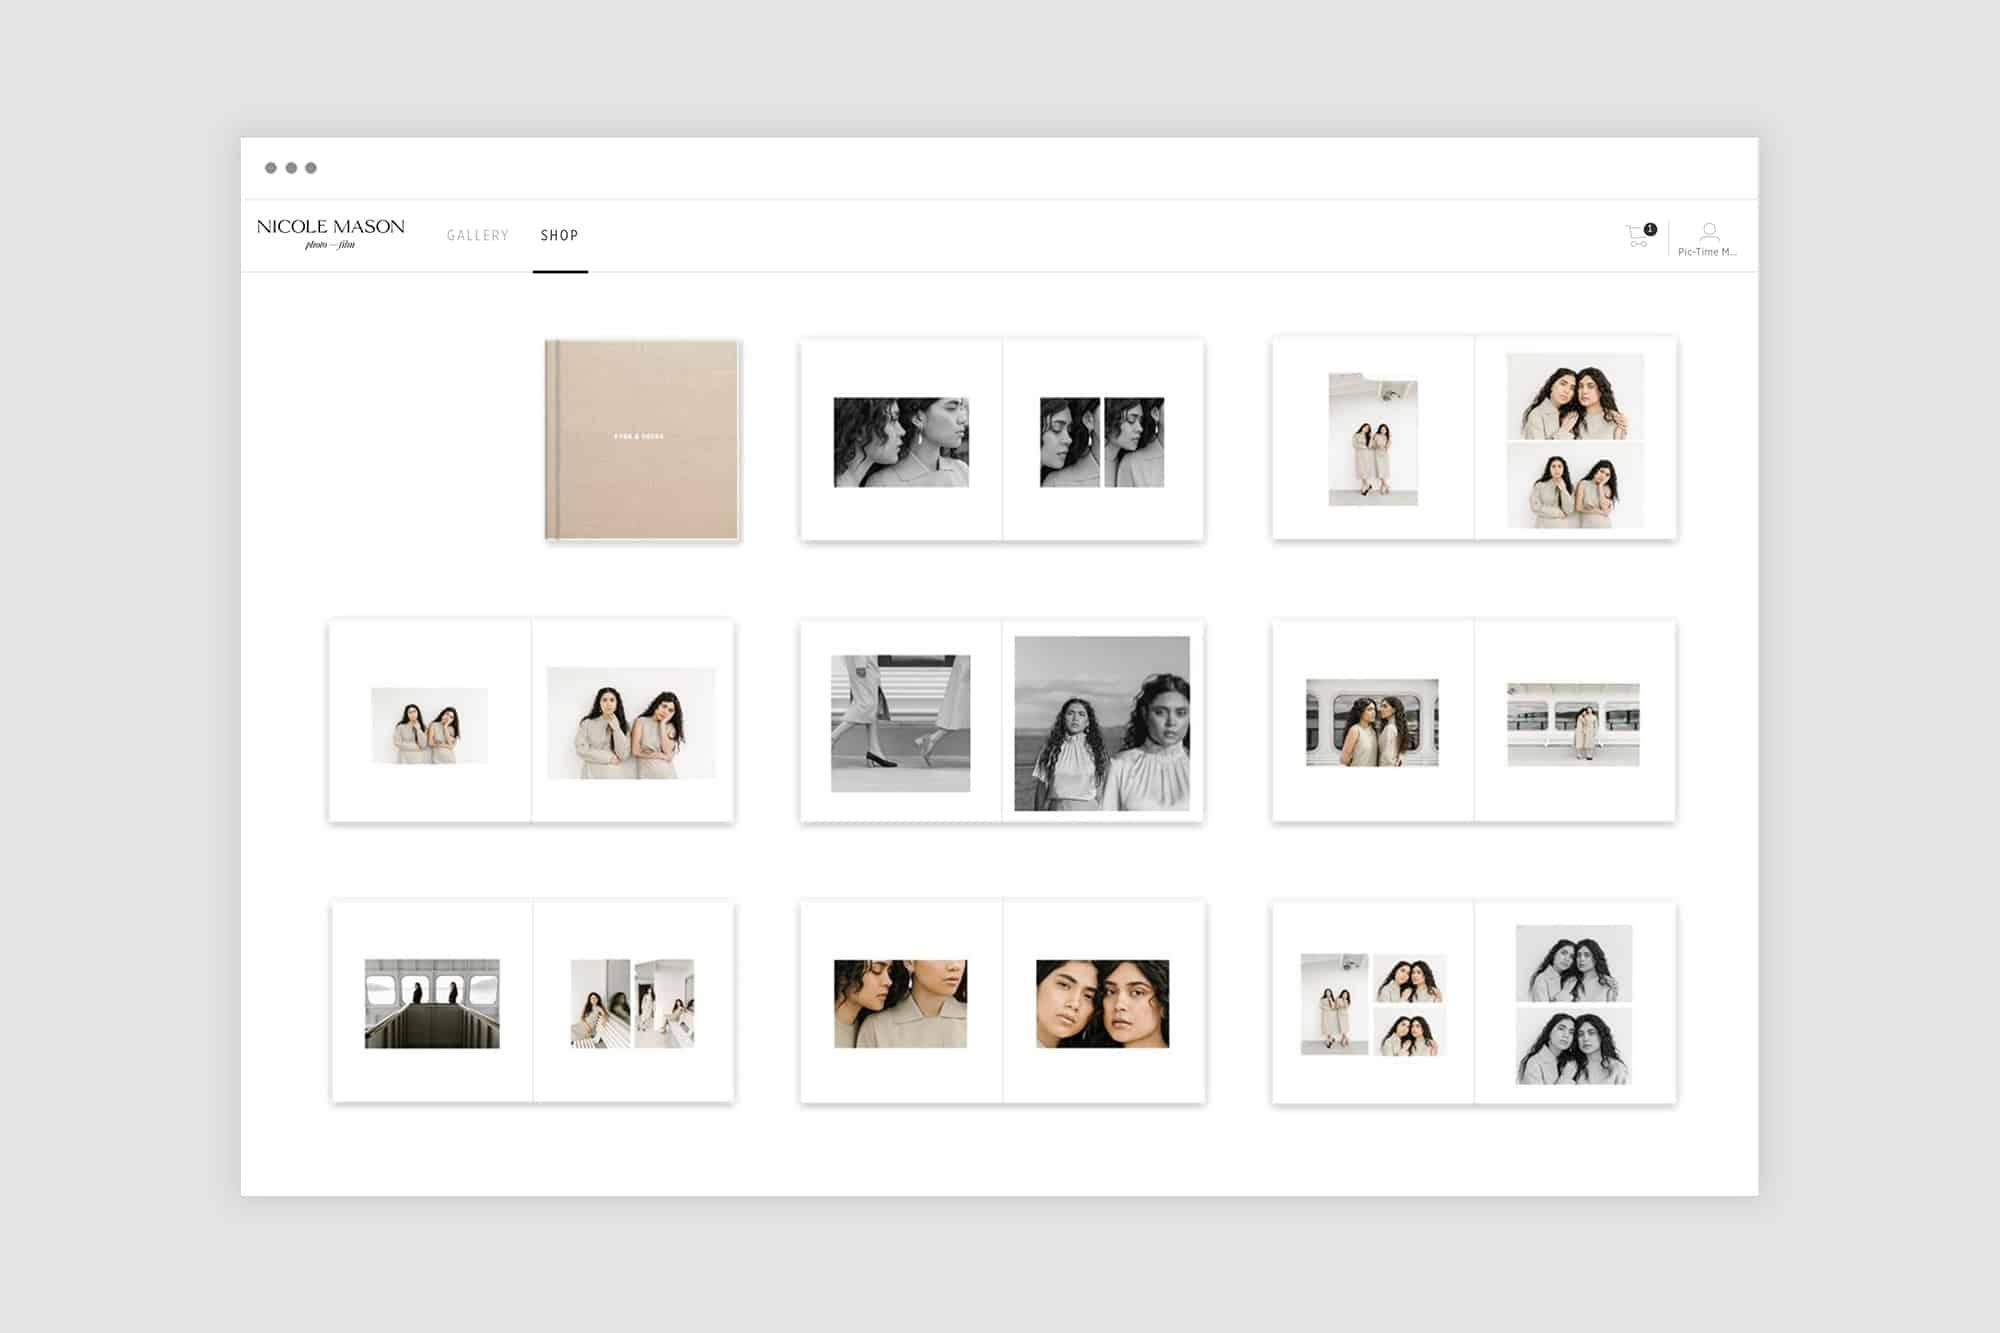 Selling Photo Albums In The Digital Age Lookslikefilm